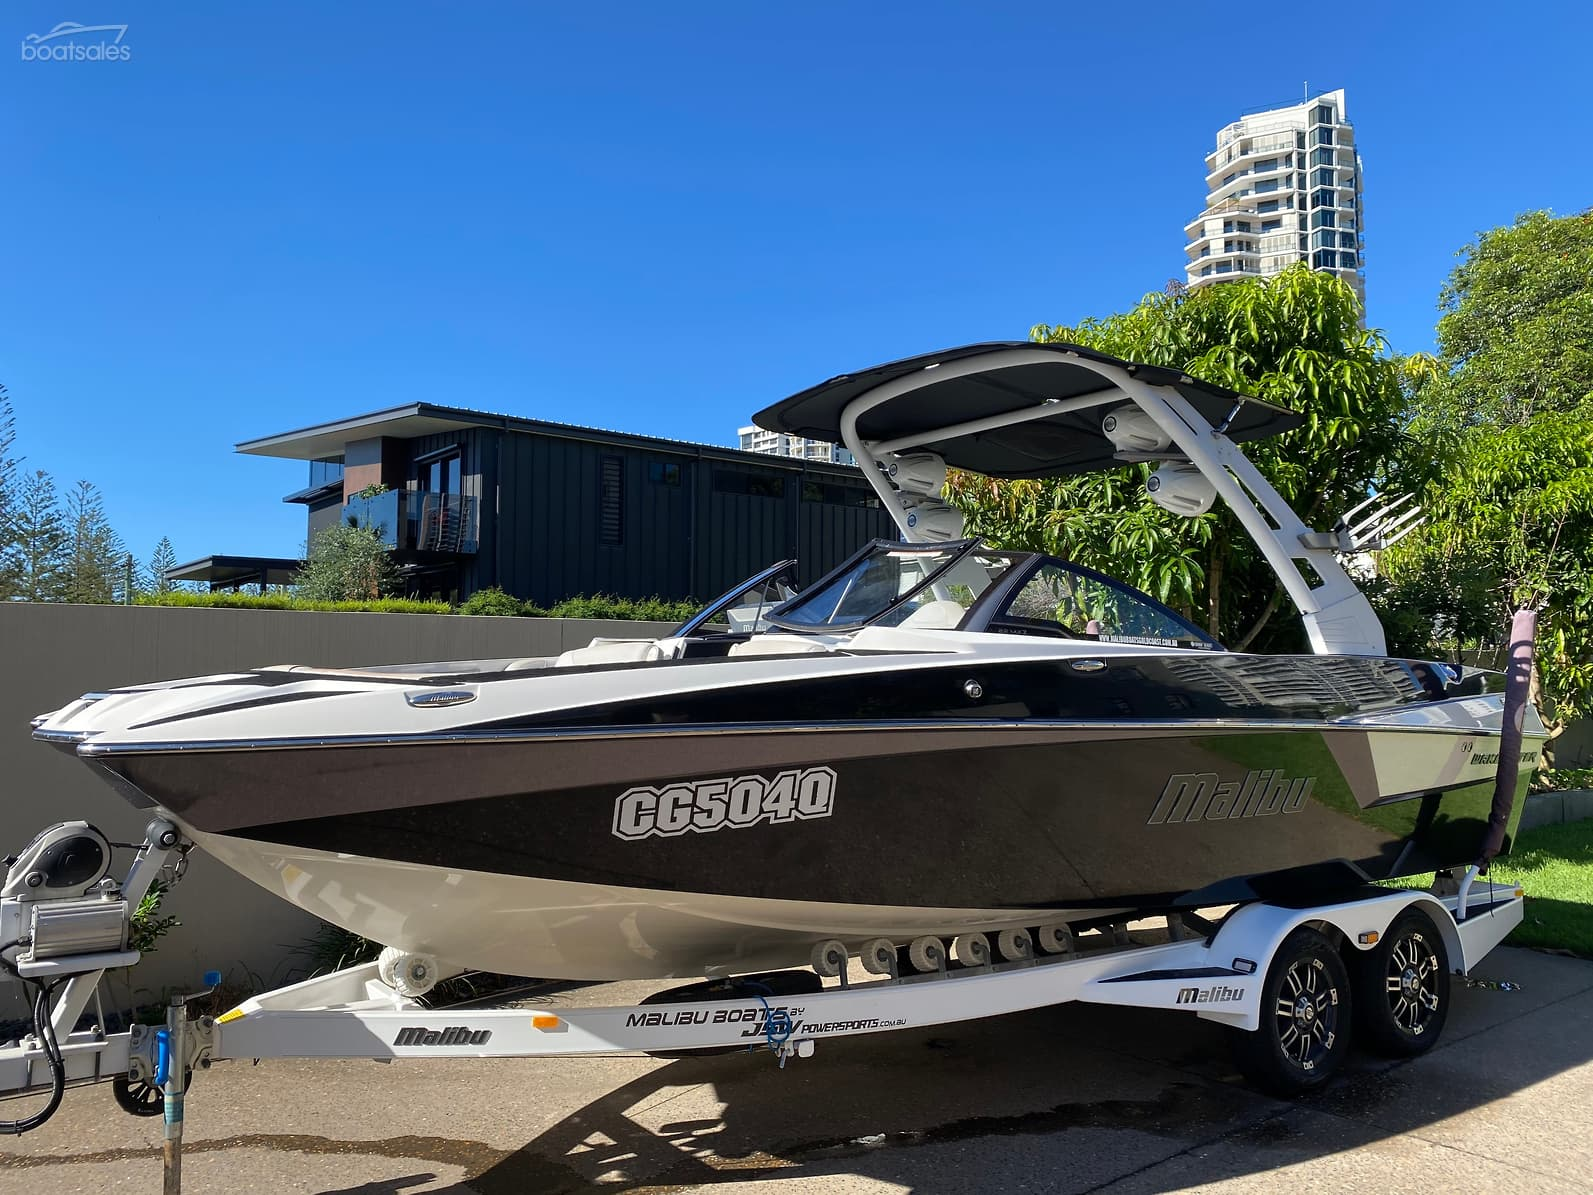 Malibu boats Gold Coast